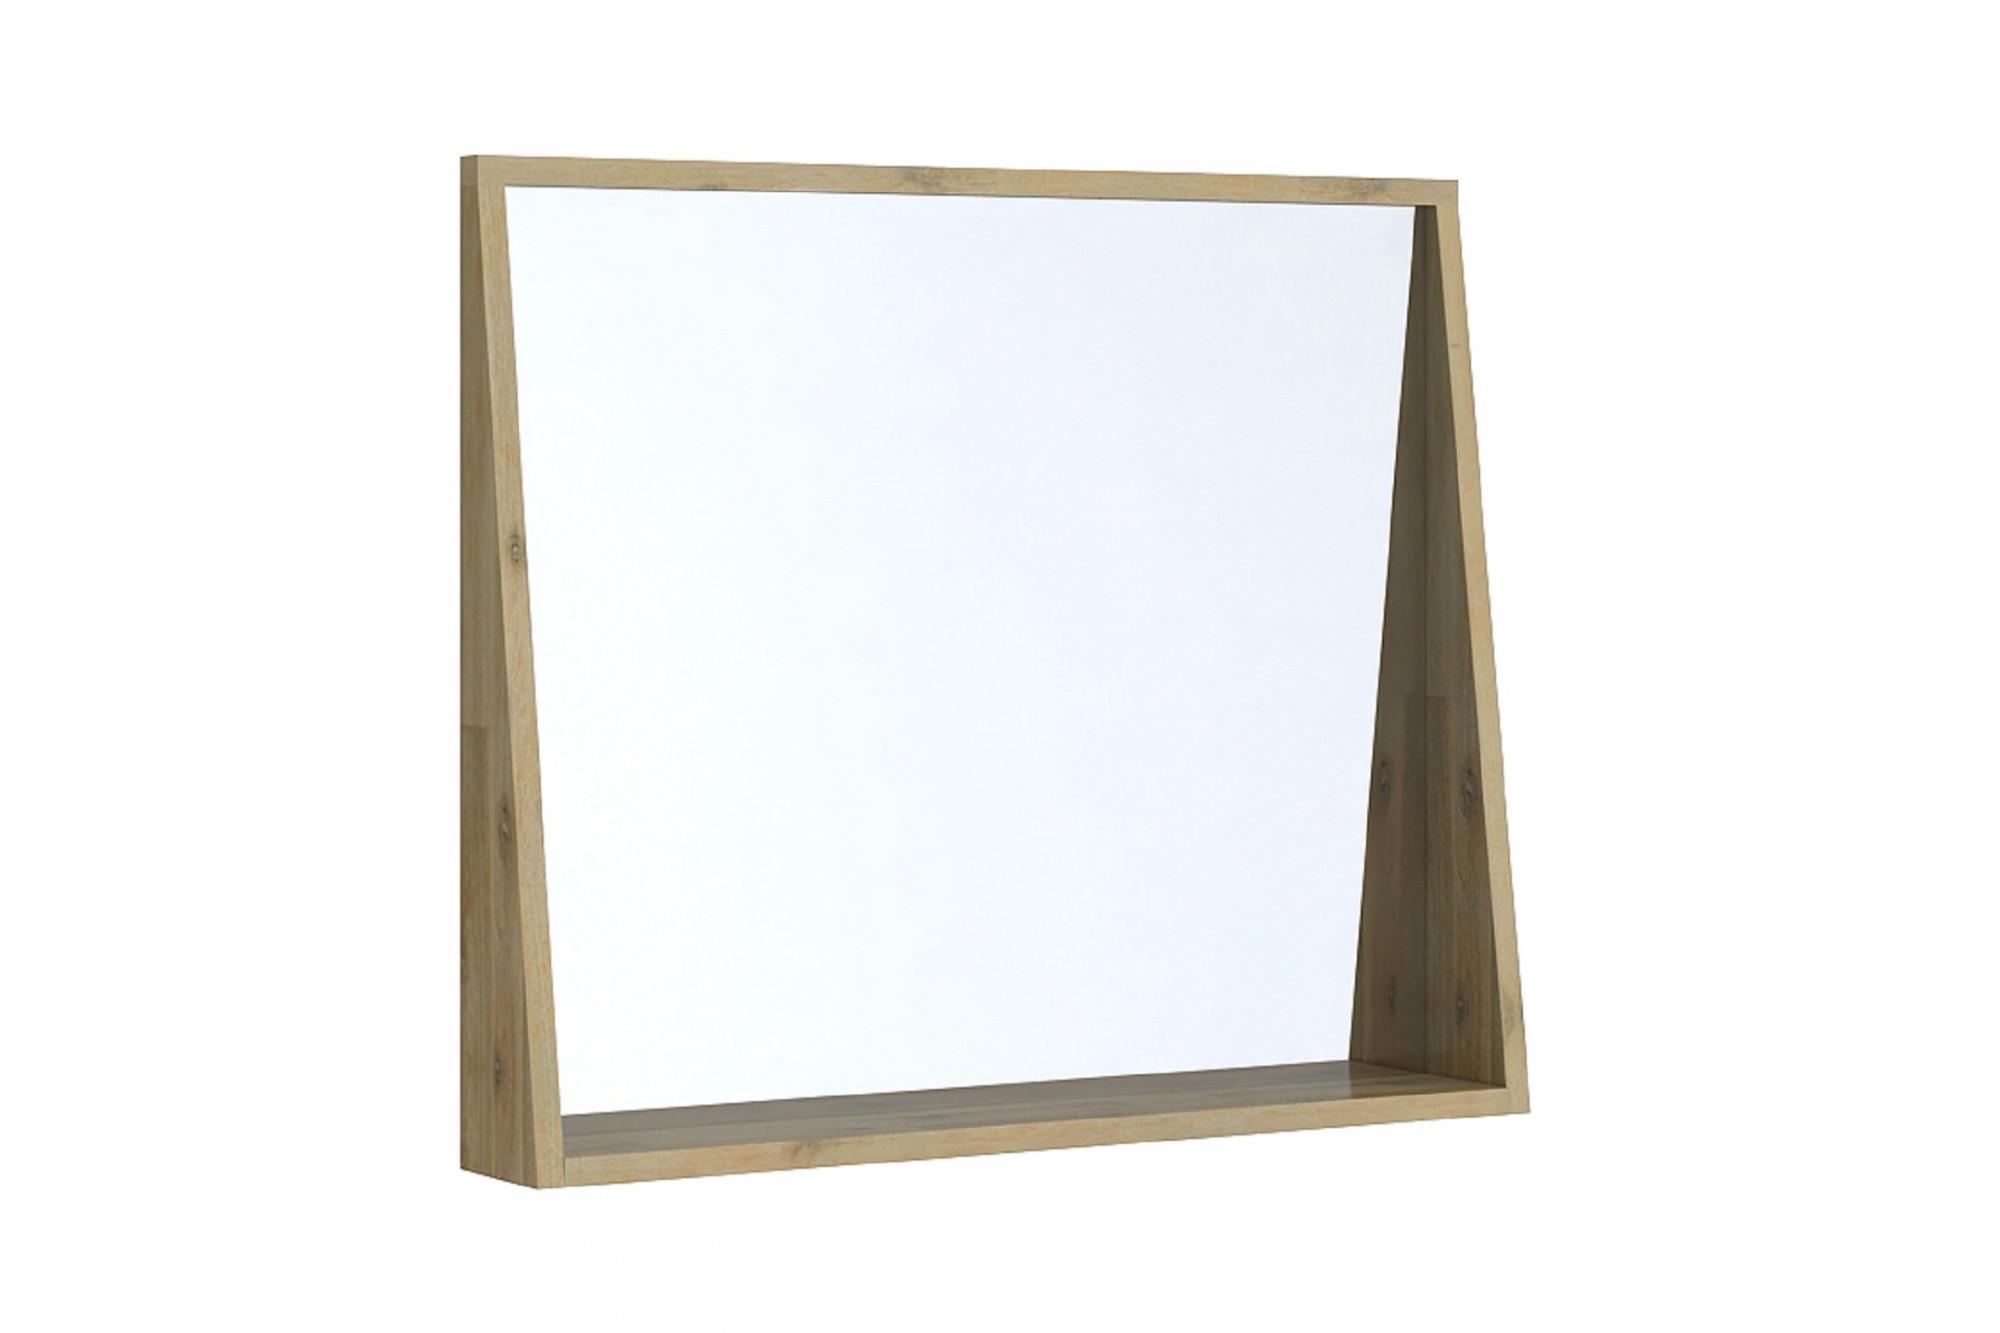 Tablette Salle De Bain 80 Cm miroir de salle de bain en bois massif fuji - hellin